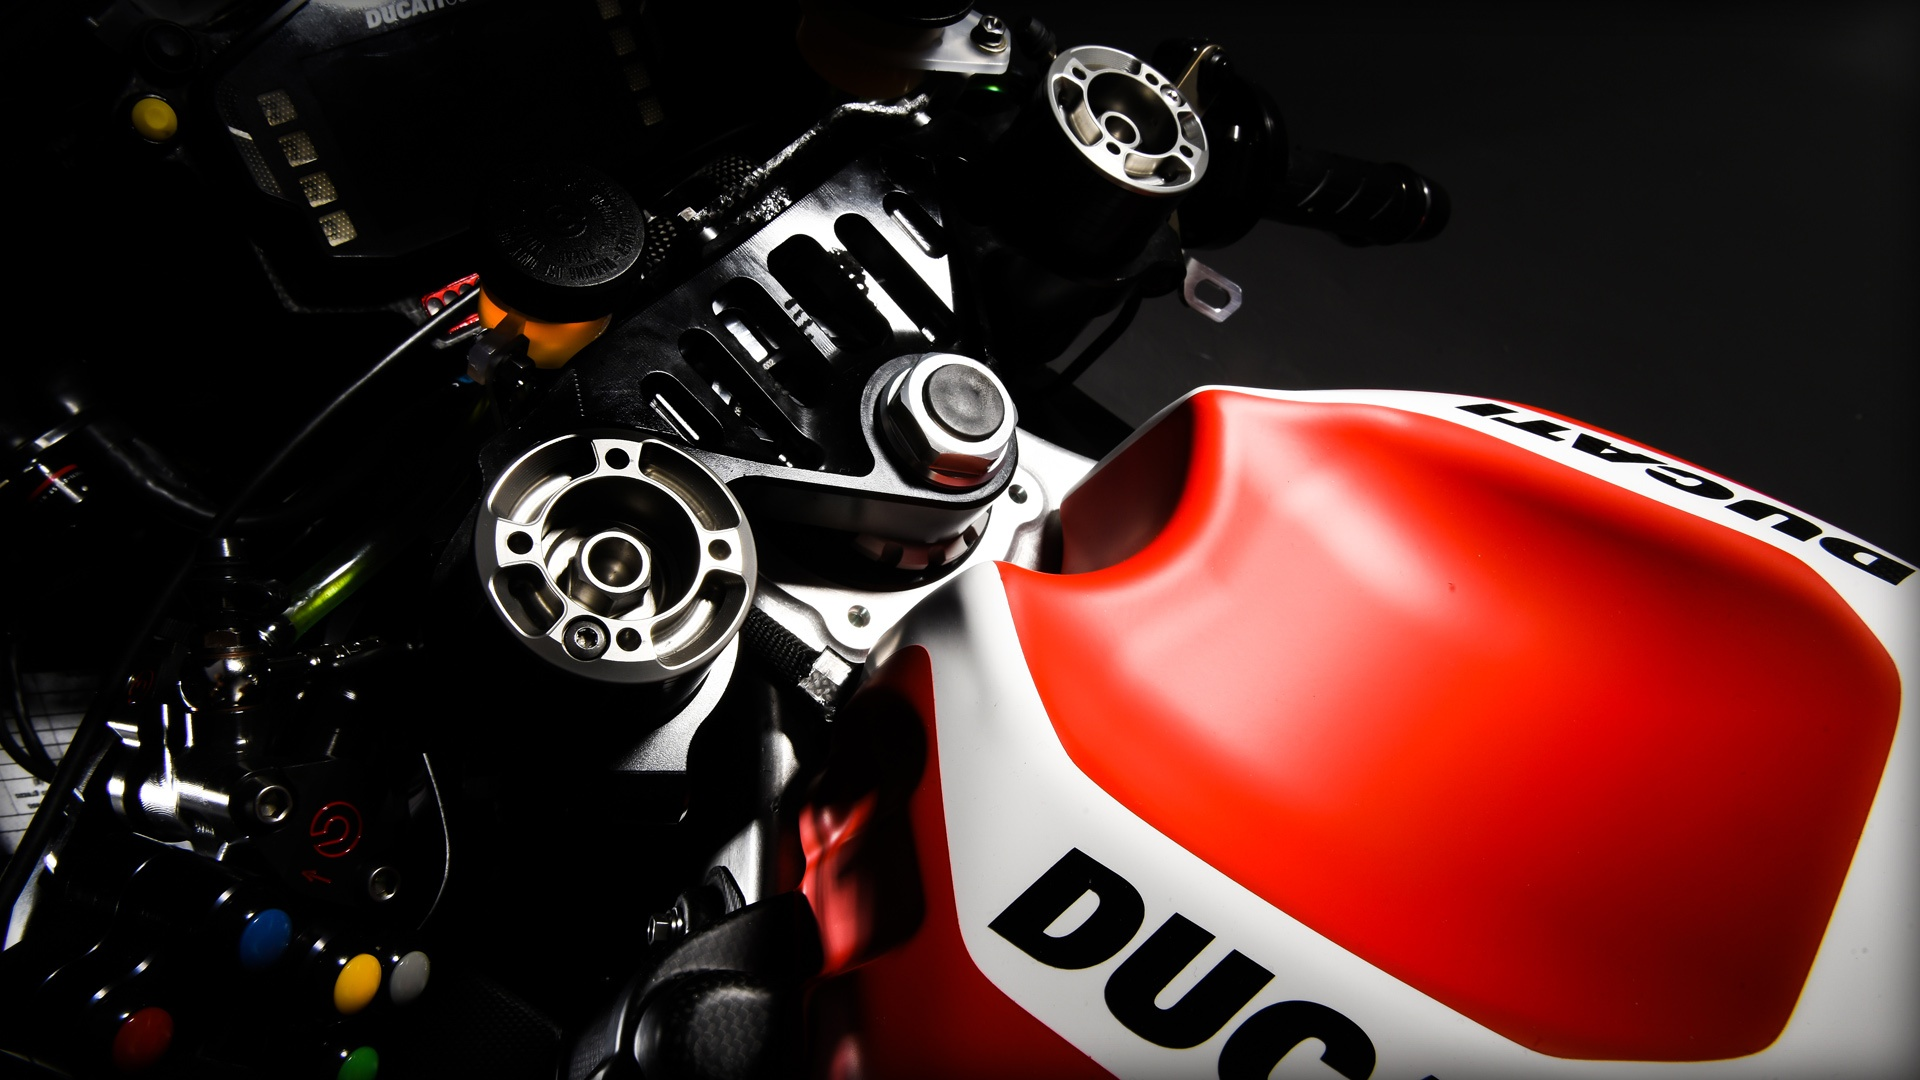 ducati-racing